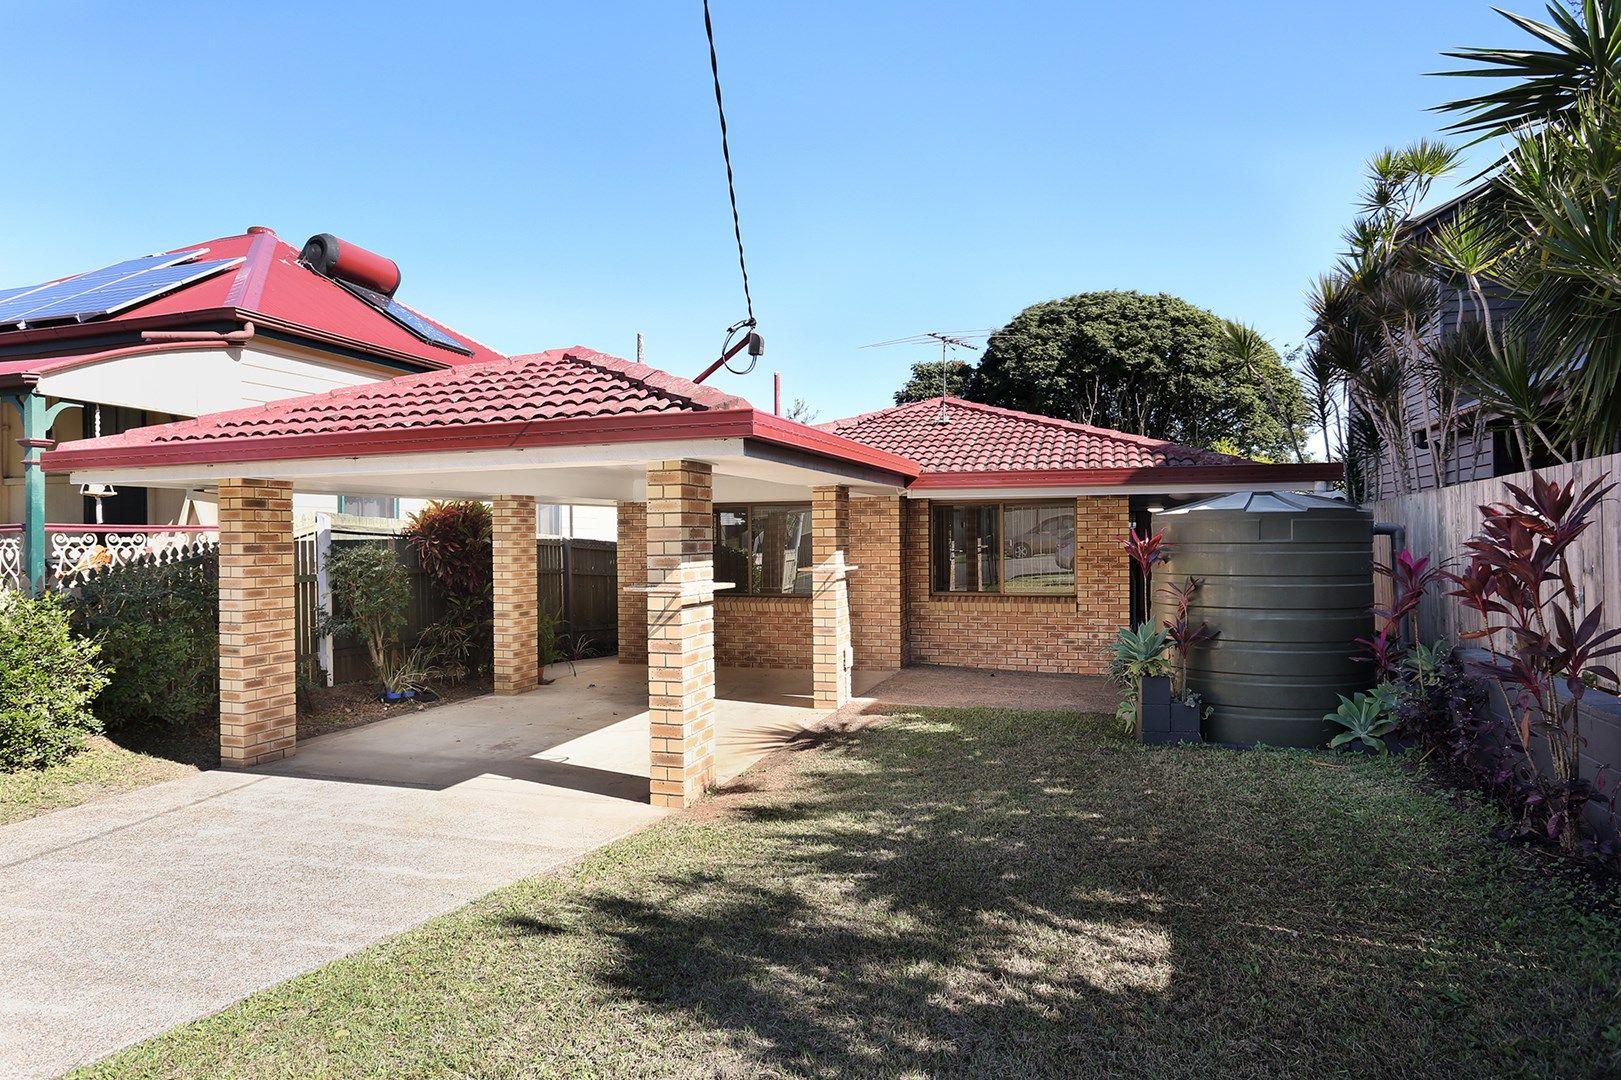 11 Somervell Street, Annerley QLD 4103, Image 0